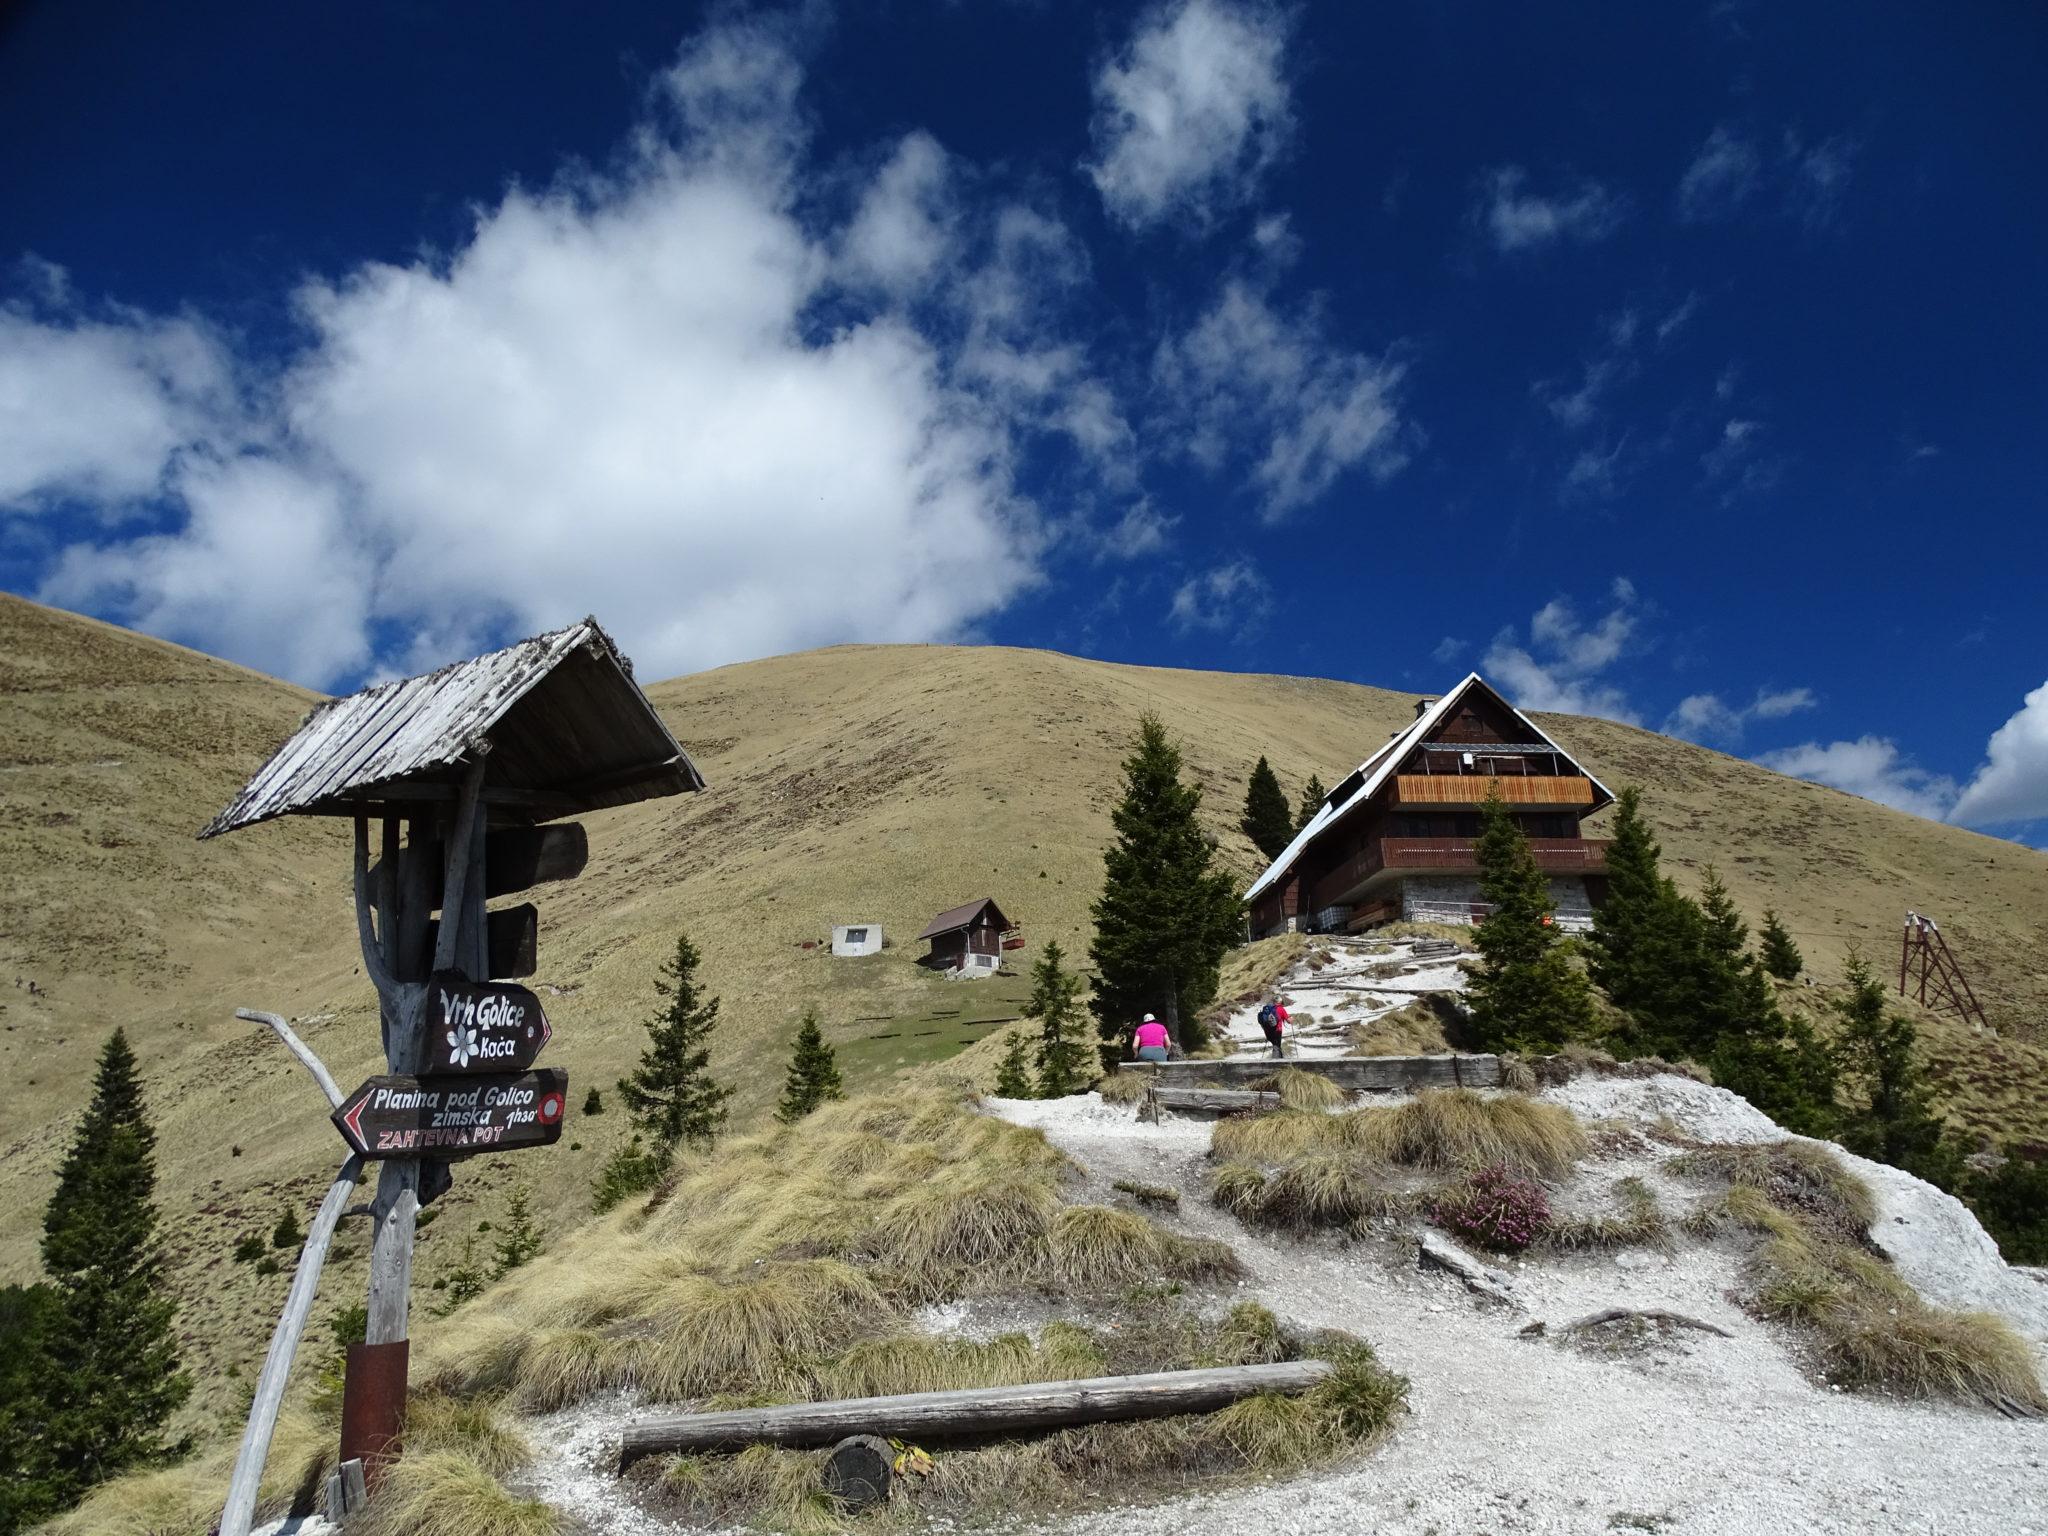 A mountain hut, mountains, sun